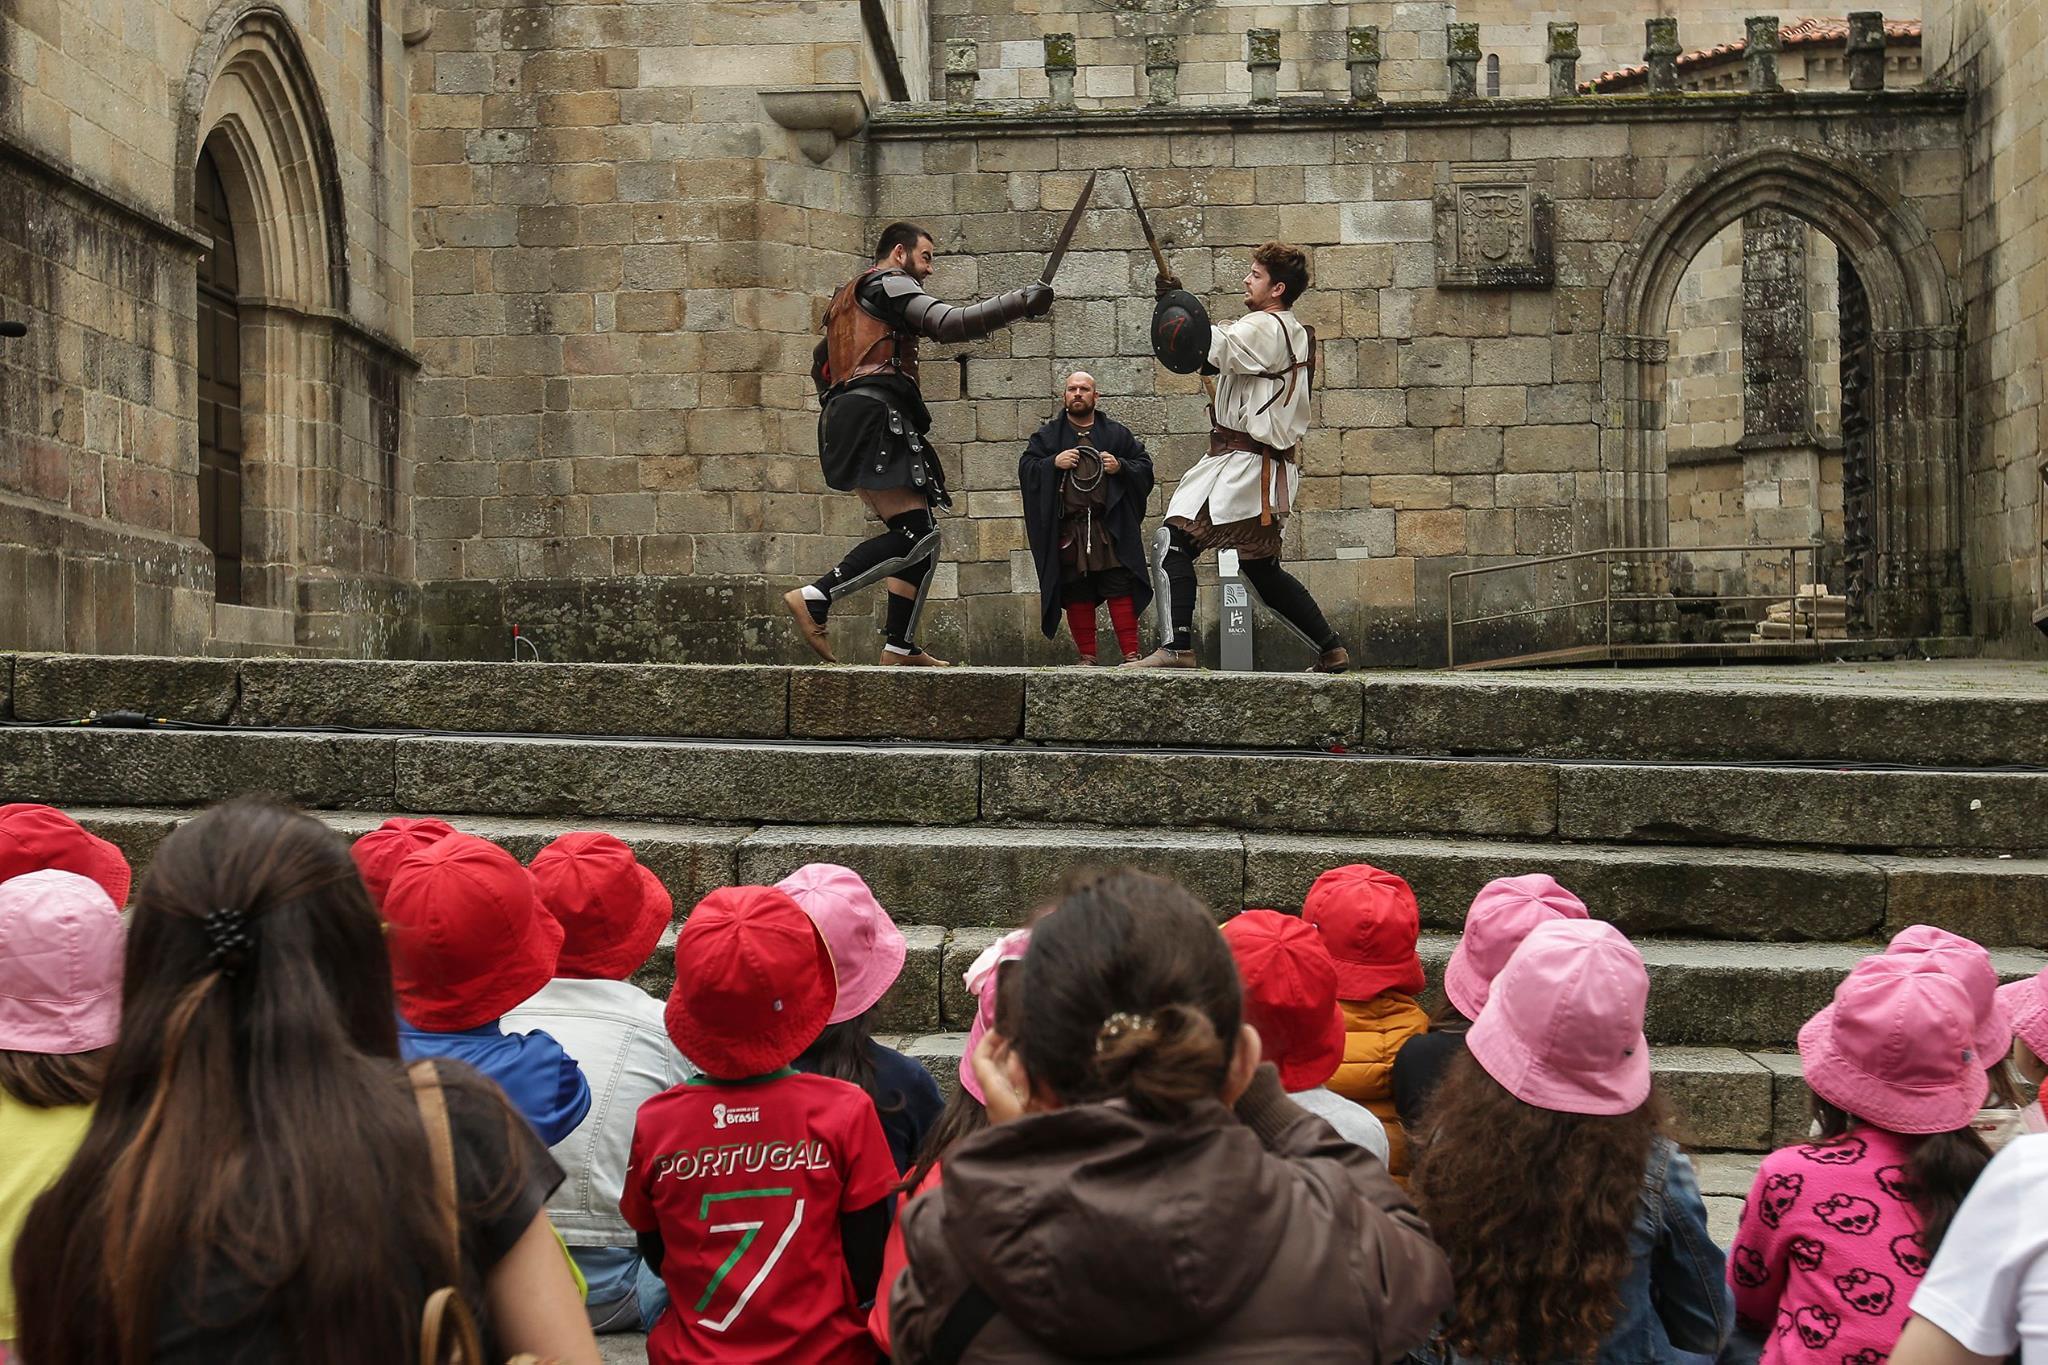 Braga Romana Luta de Gladiadores